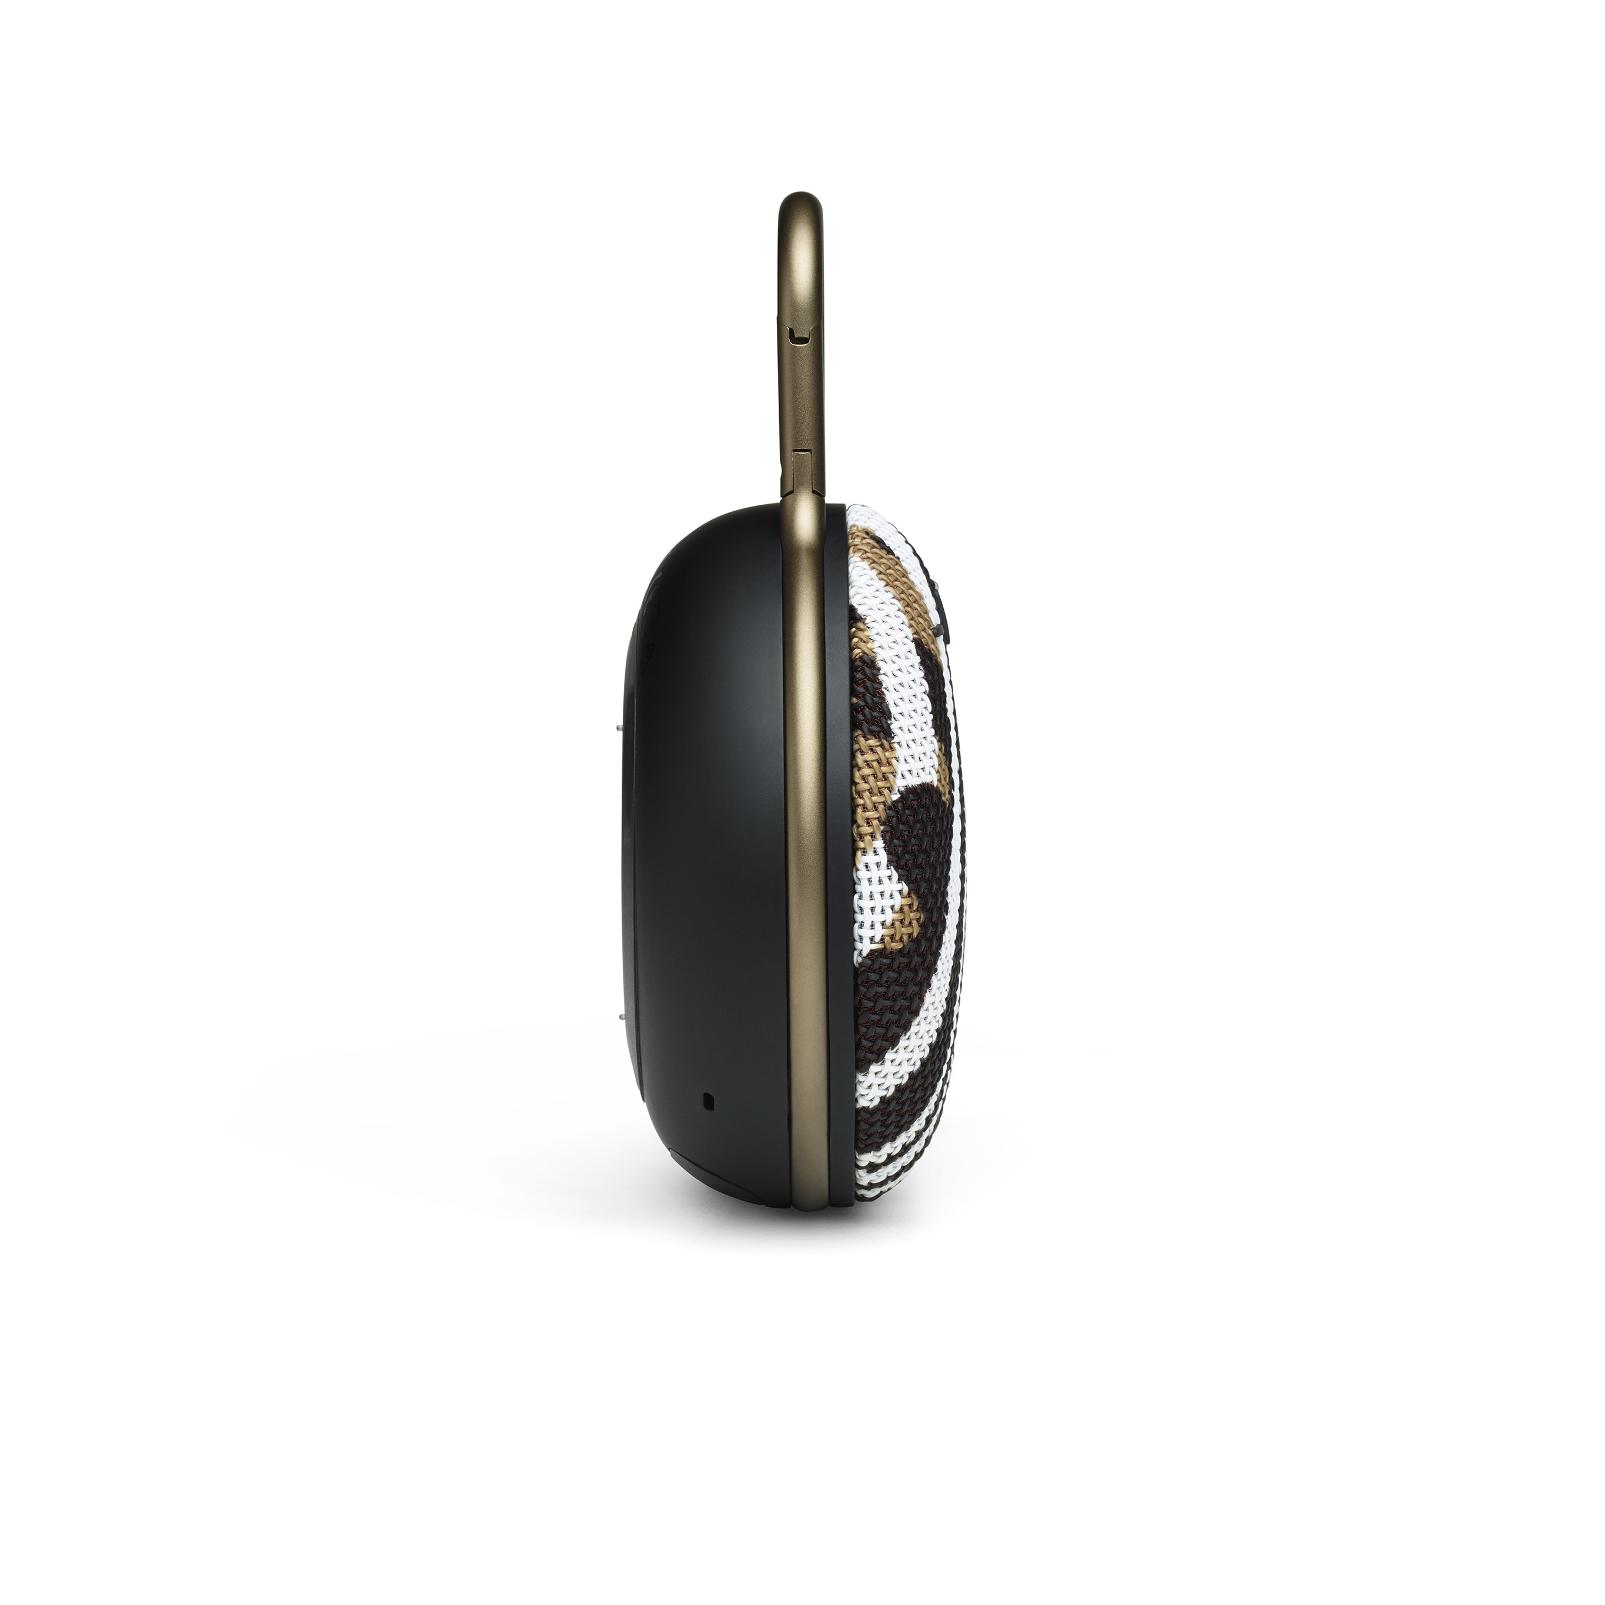 JBL CLIP 3 - BlackWhite/Brown Camo - Portable Bluetooth® speaker - Right